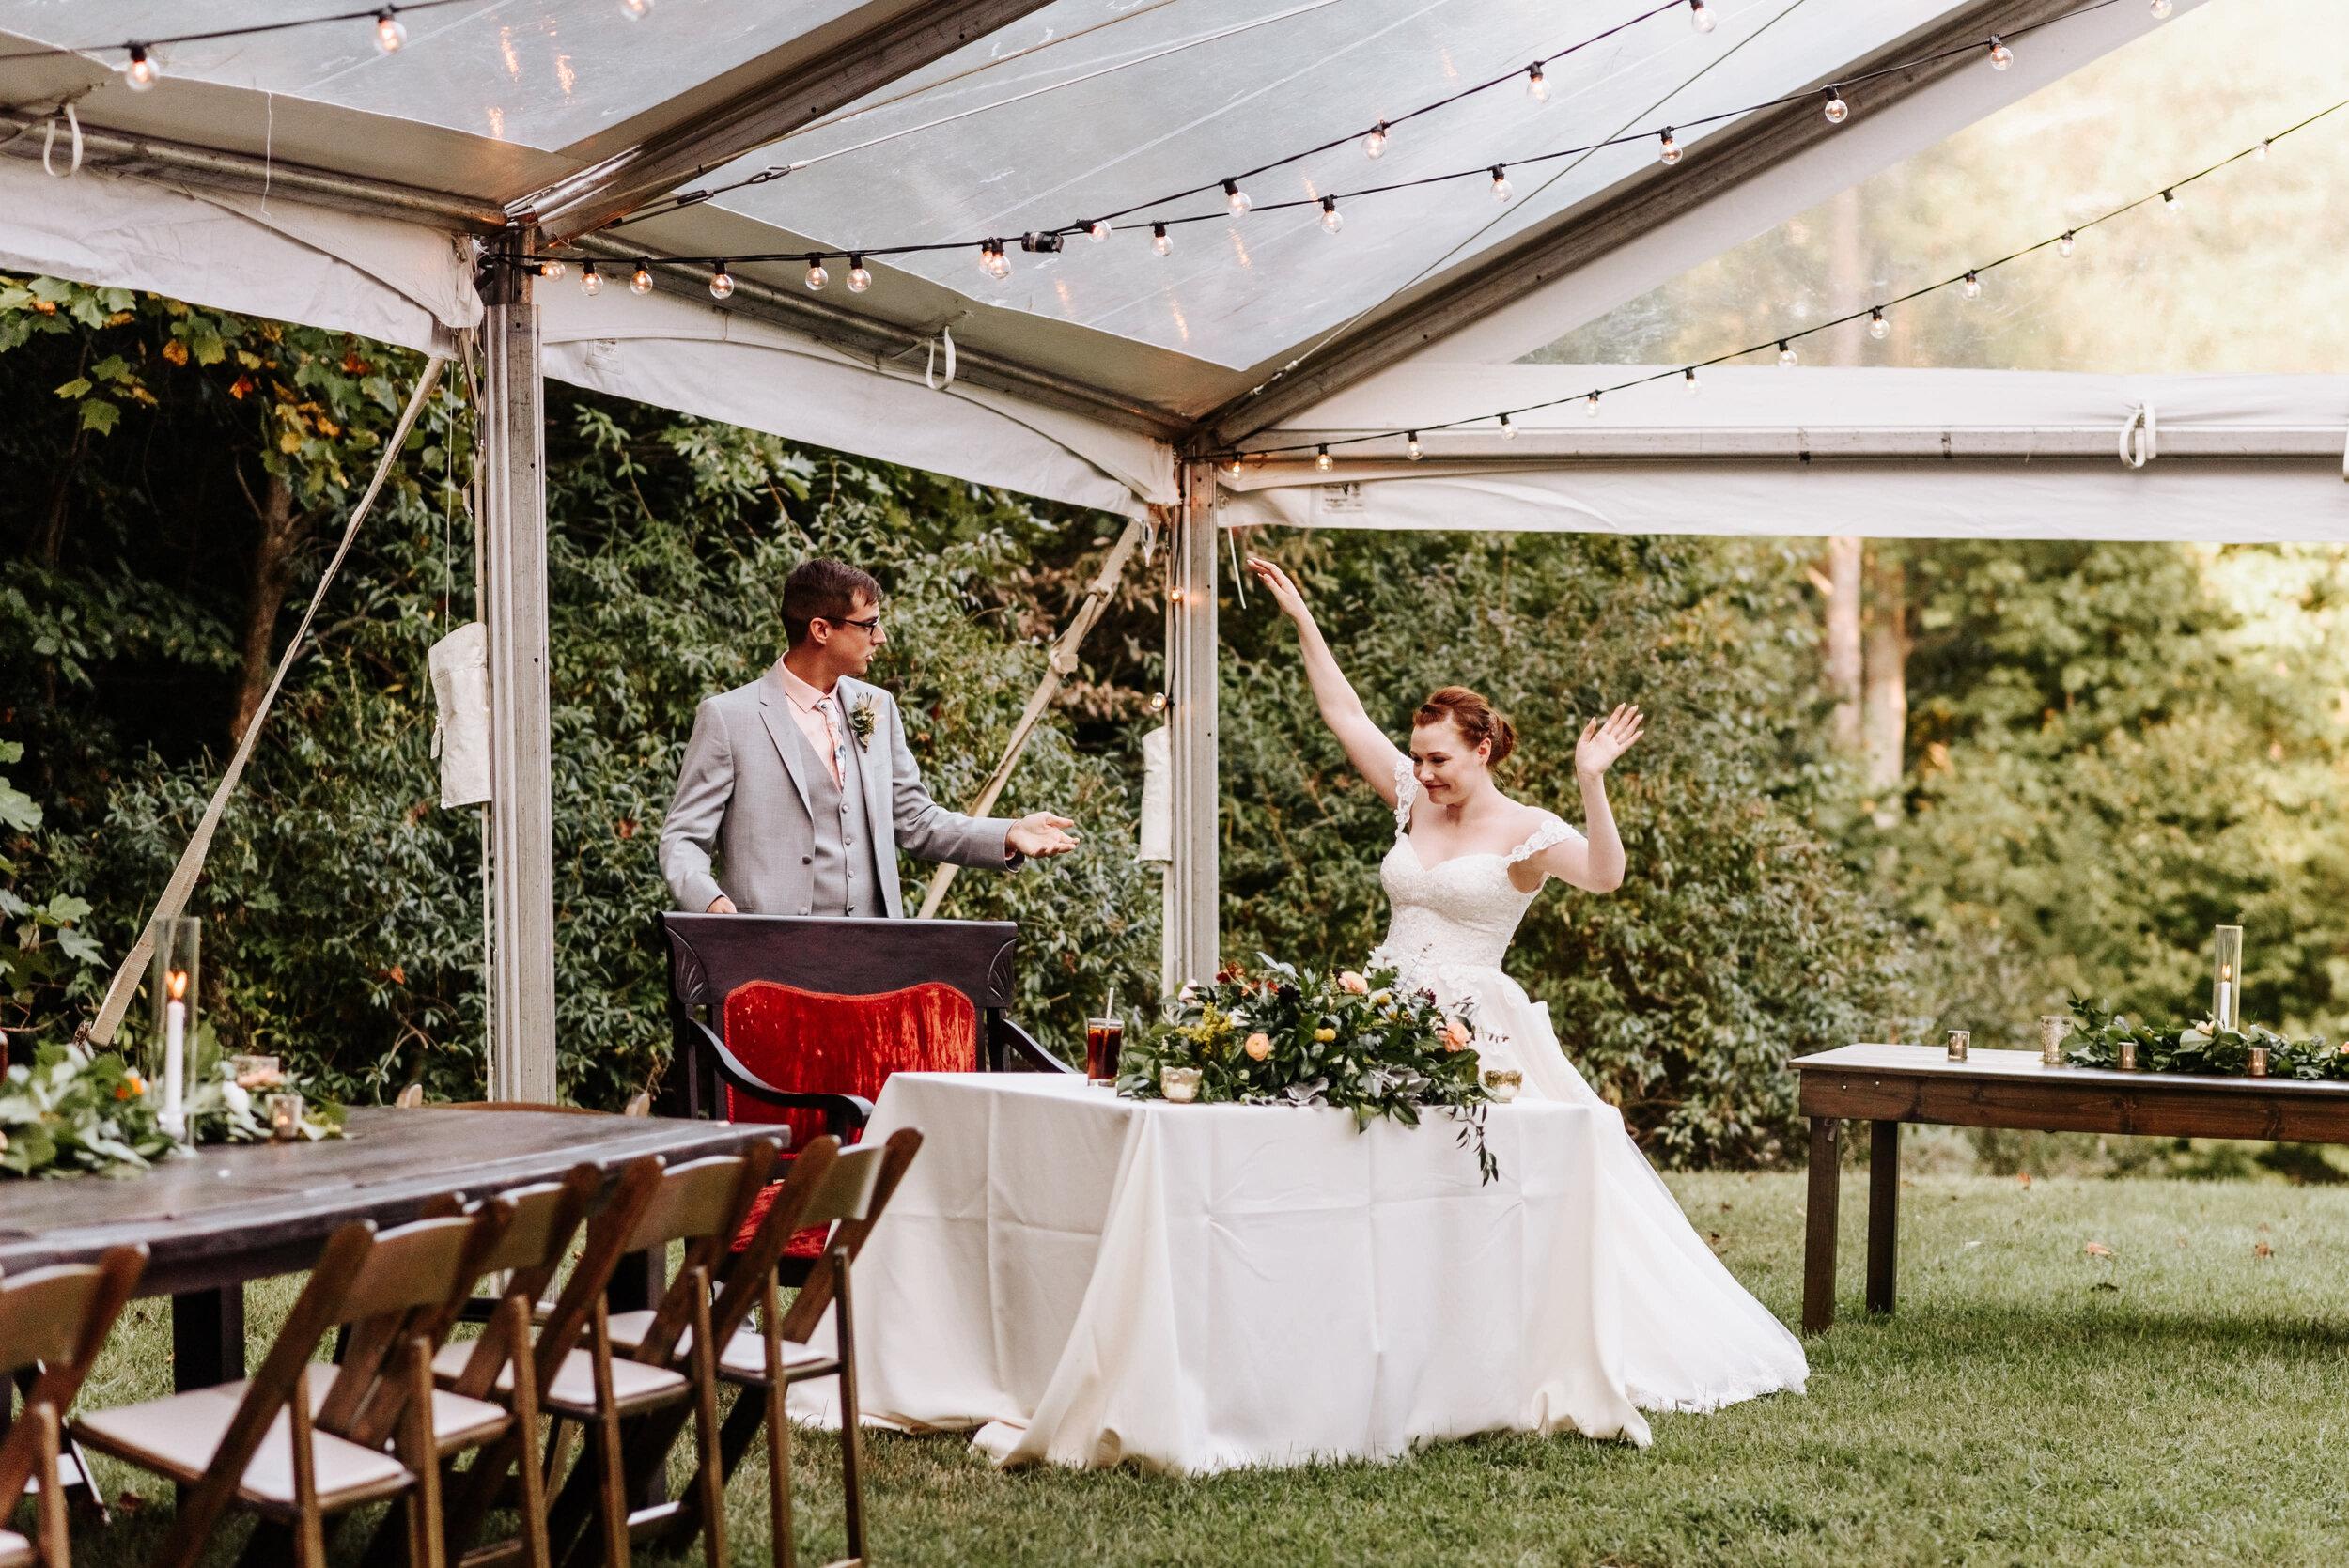 Rachel_David_Wedding_Richmond_Virginia_Photography_by_V_59.jpg